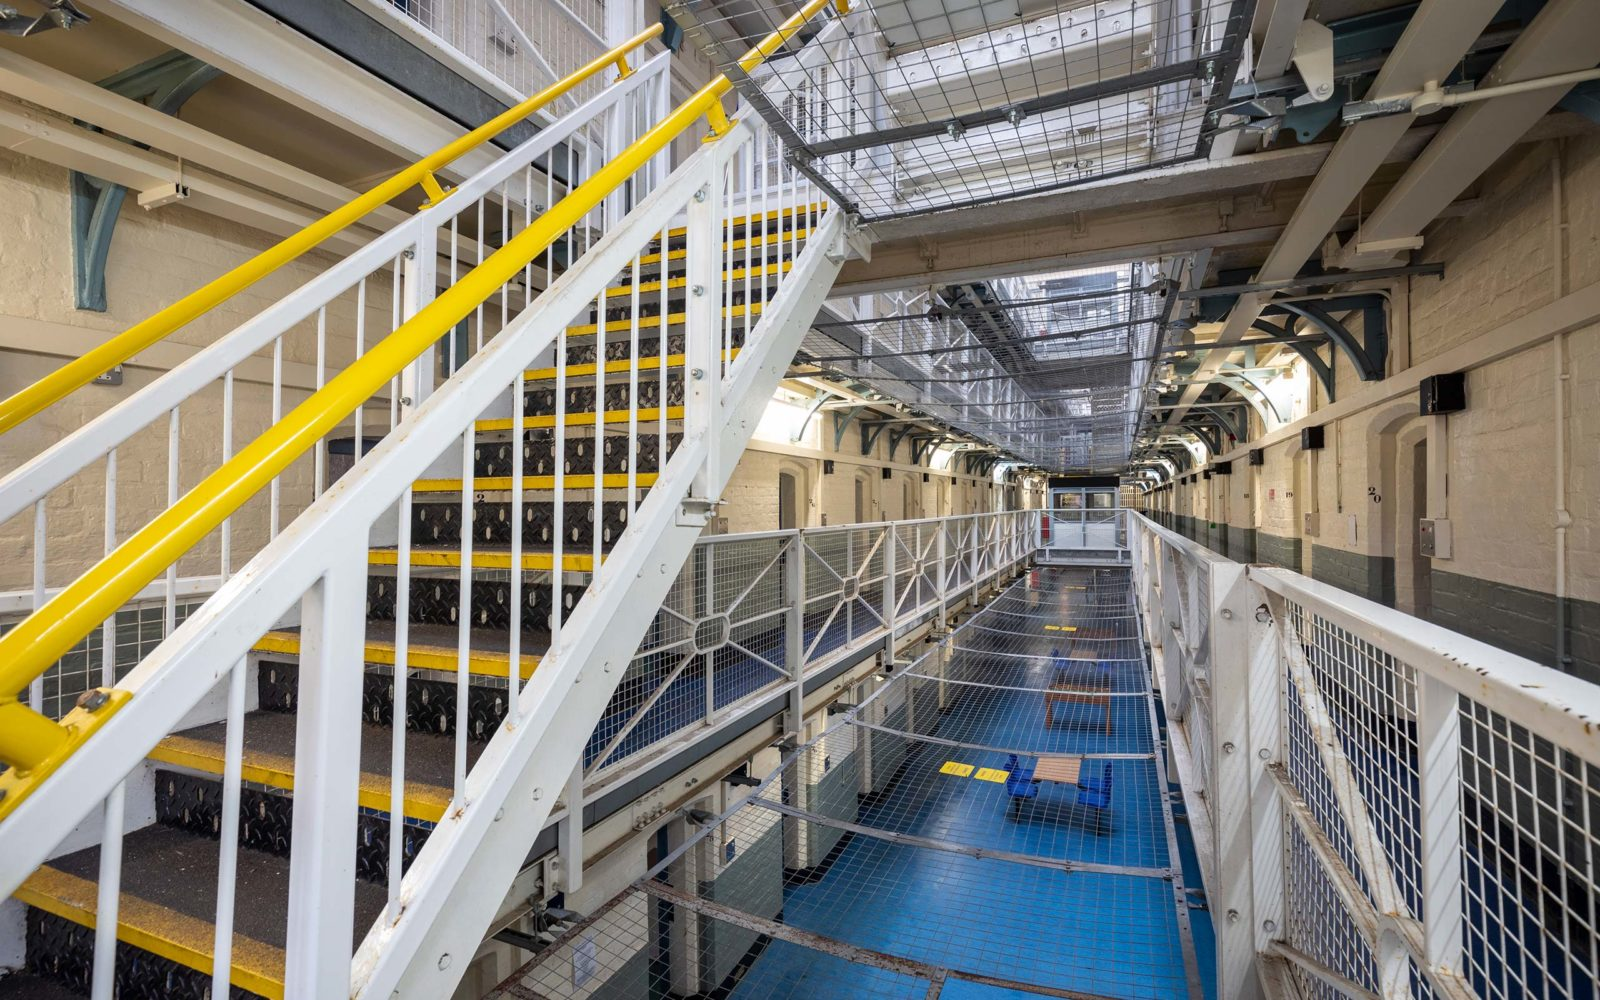 Shepton Mallet Prison Pupil Referrals